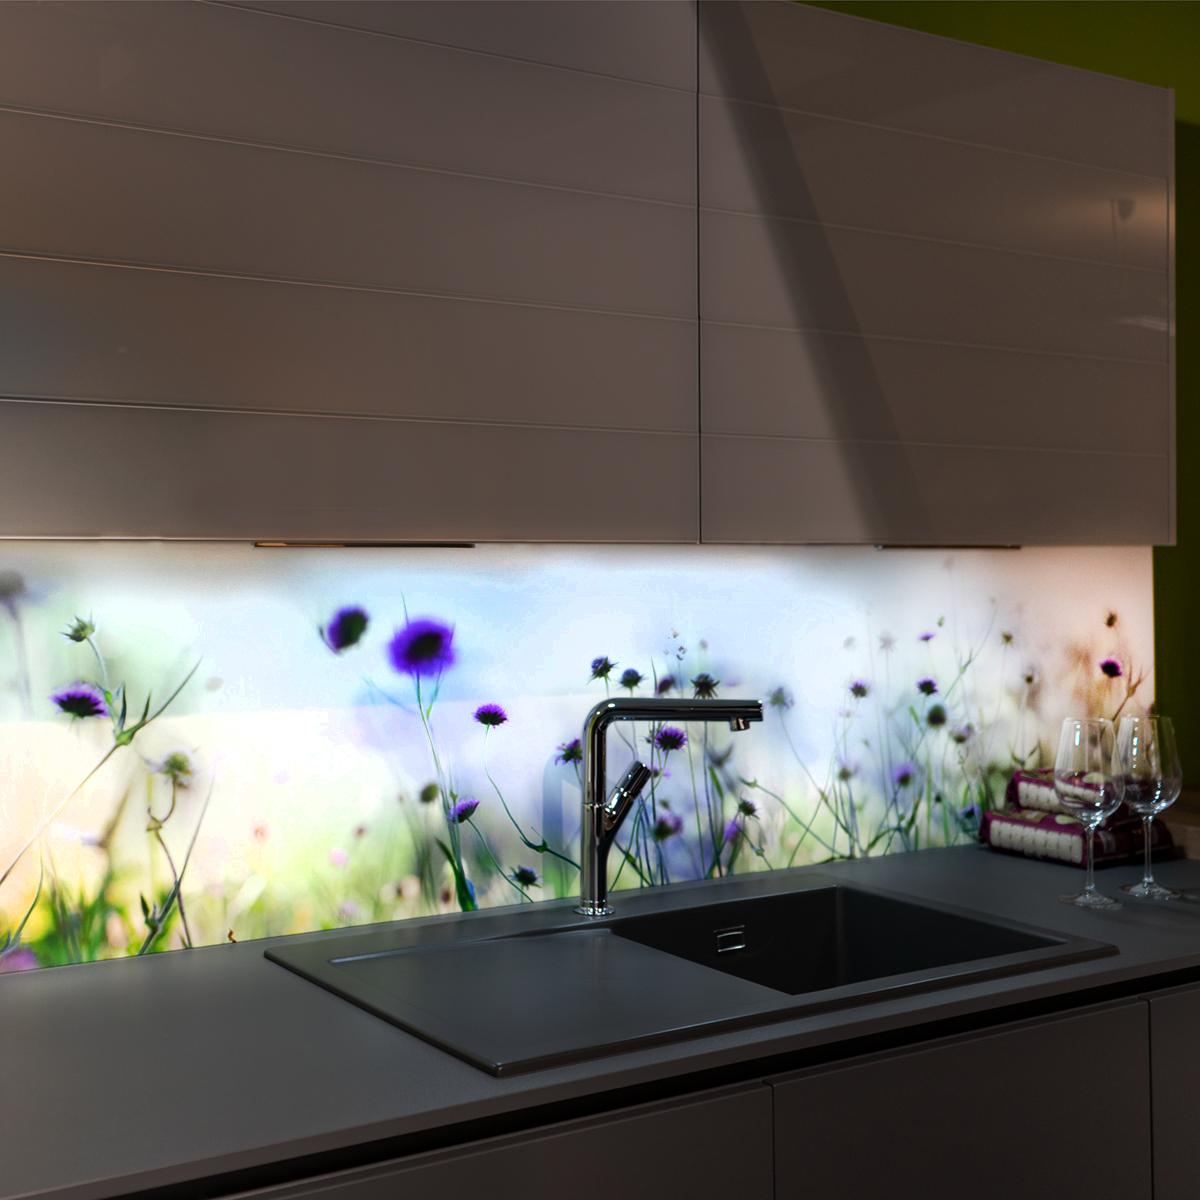 Licht-Konzepte-Kueche-Beleuchtung-Nische_SAAR-Kuechen